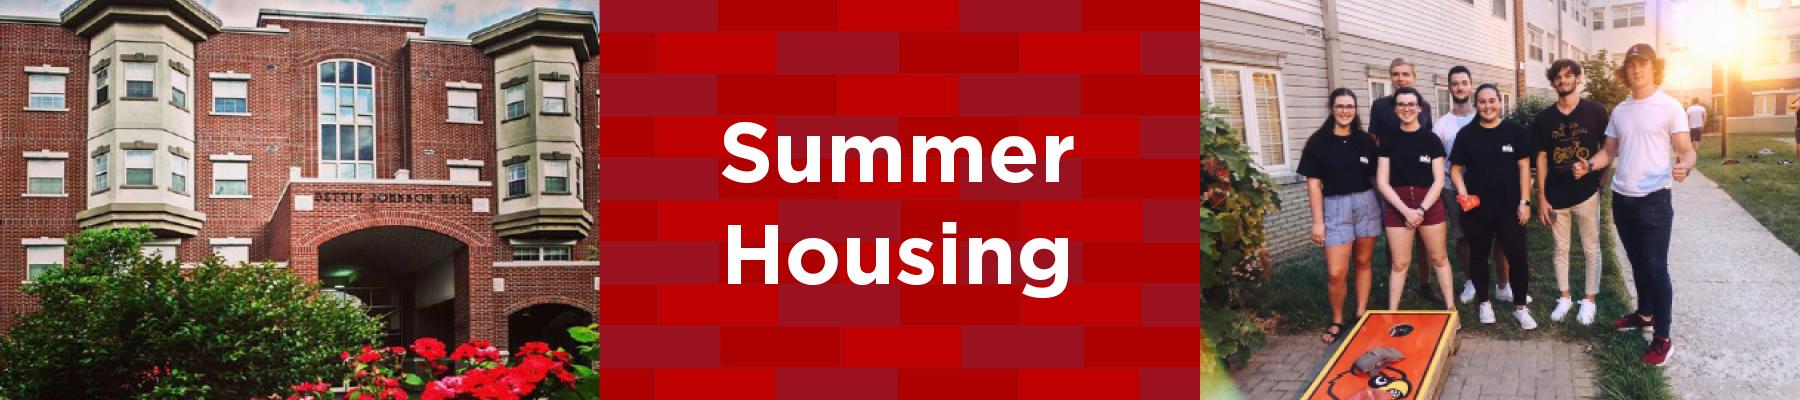 summer housing in bettie johnson hall